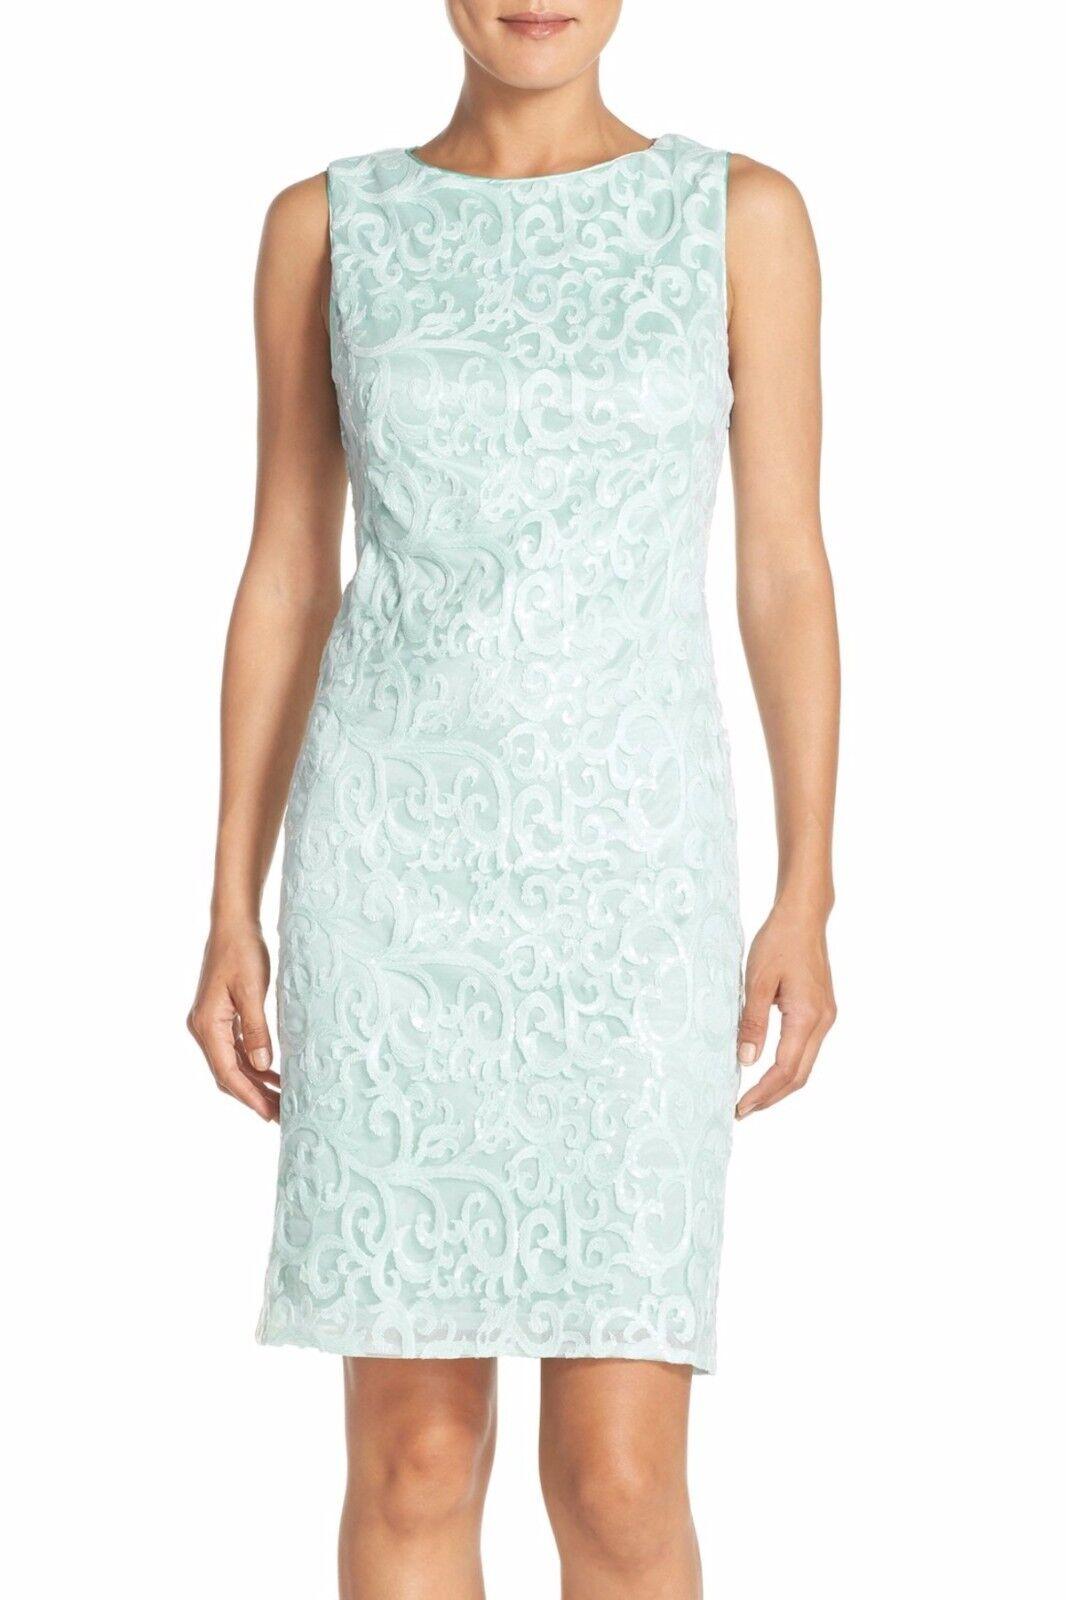 NWT  Sue Wong Embroidered Mesh Sheath Dress Sky bluee {SZ 4 ]  N540